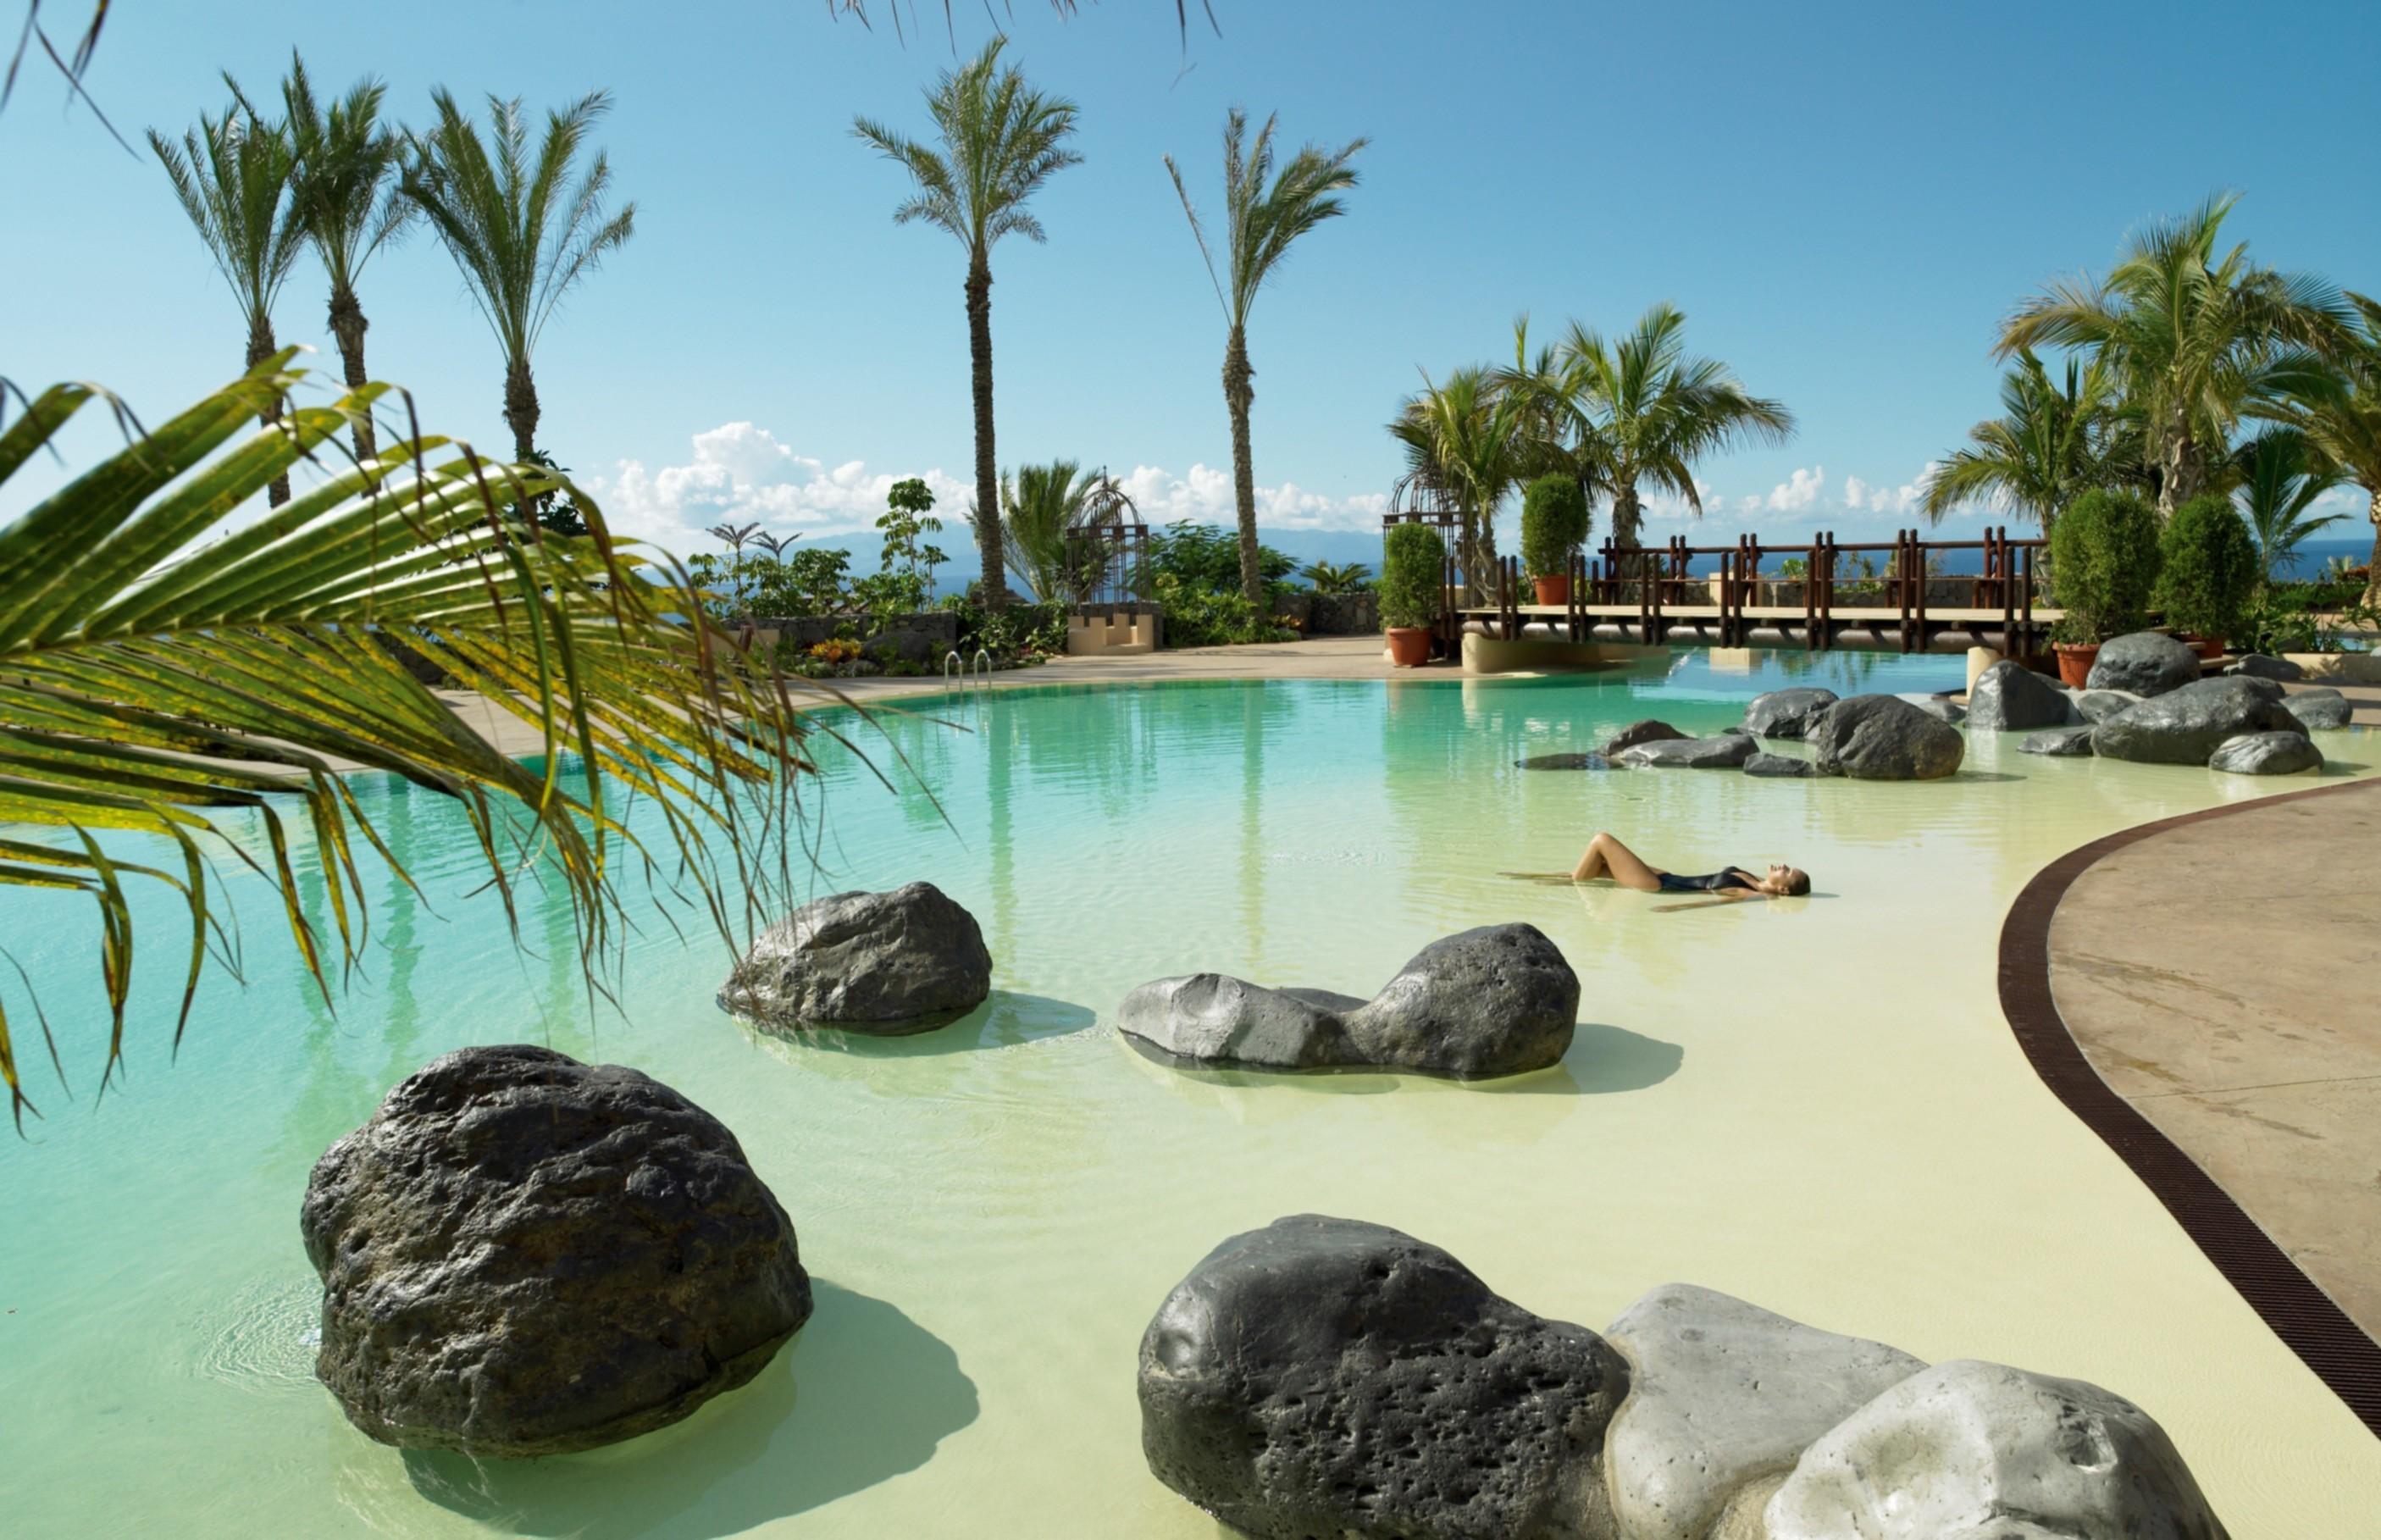 Las 10 mejores piscinas de hotel españolas - Piscinas.com